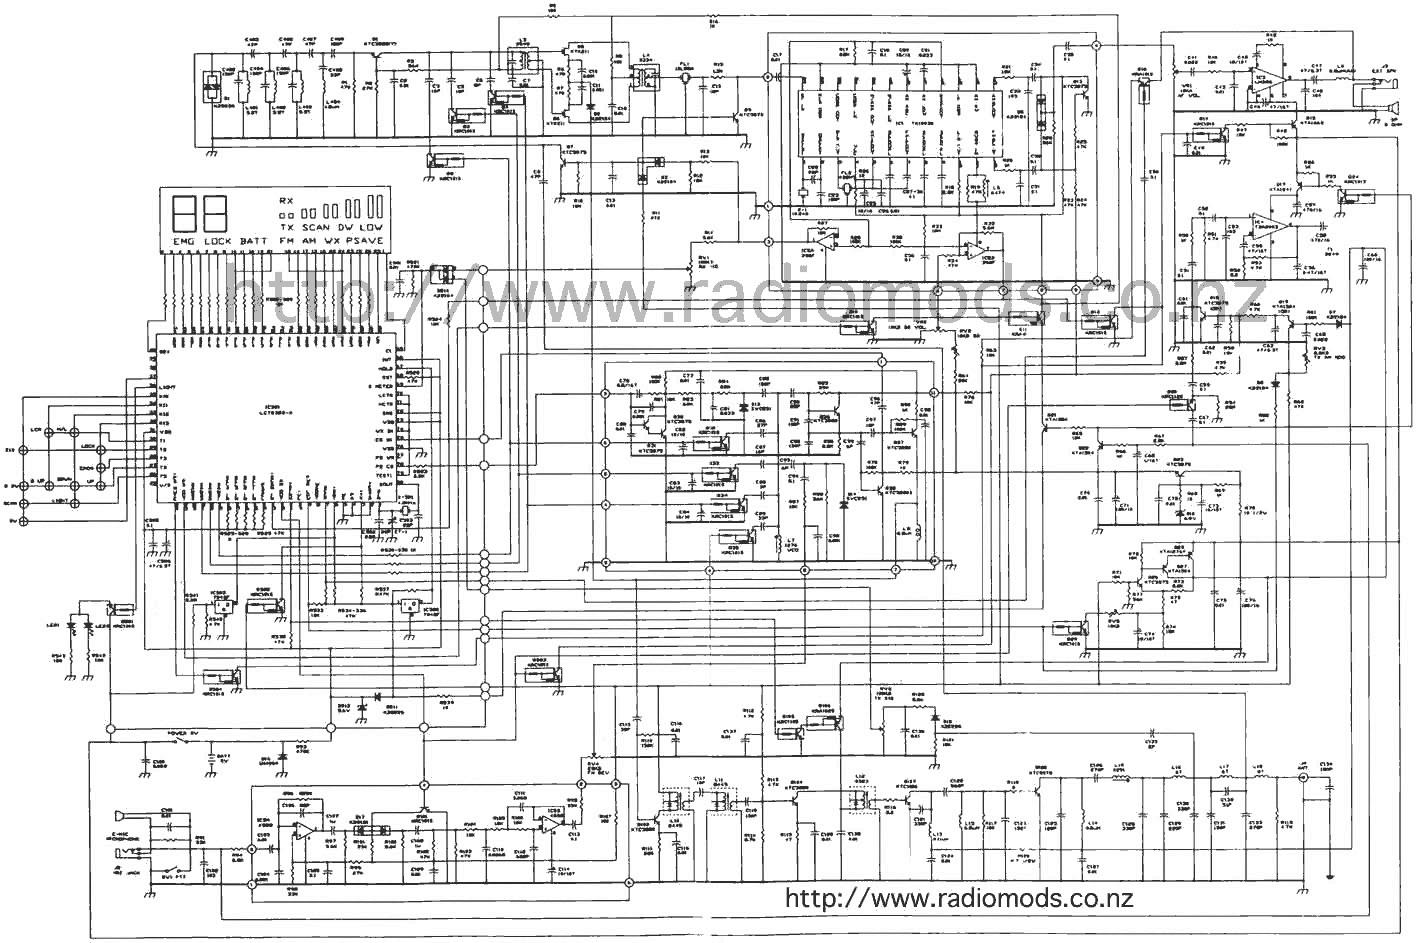 the defpom cb and ham circuit diagram page rh radiomods co nz Schematic Wiring Diagram HVAC Diagrams Schematics